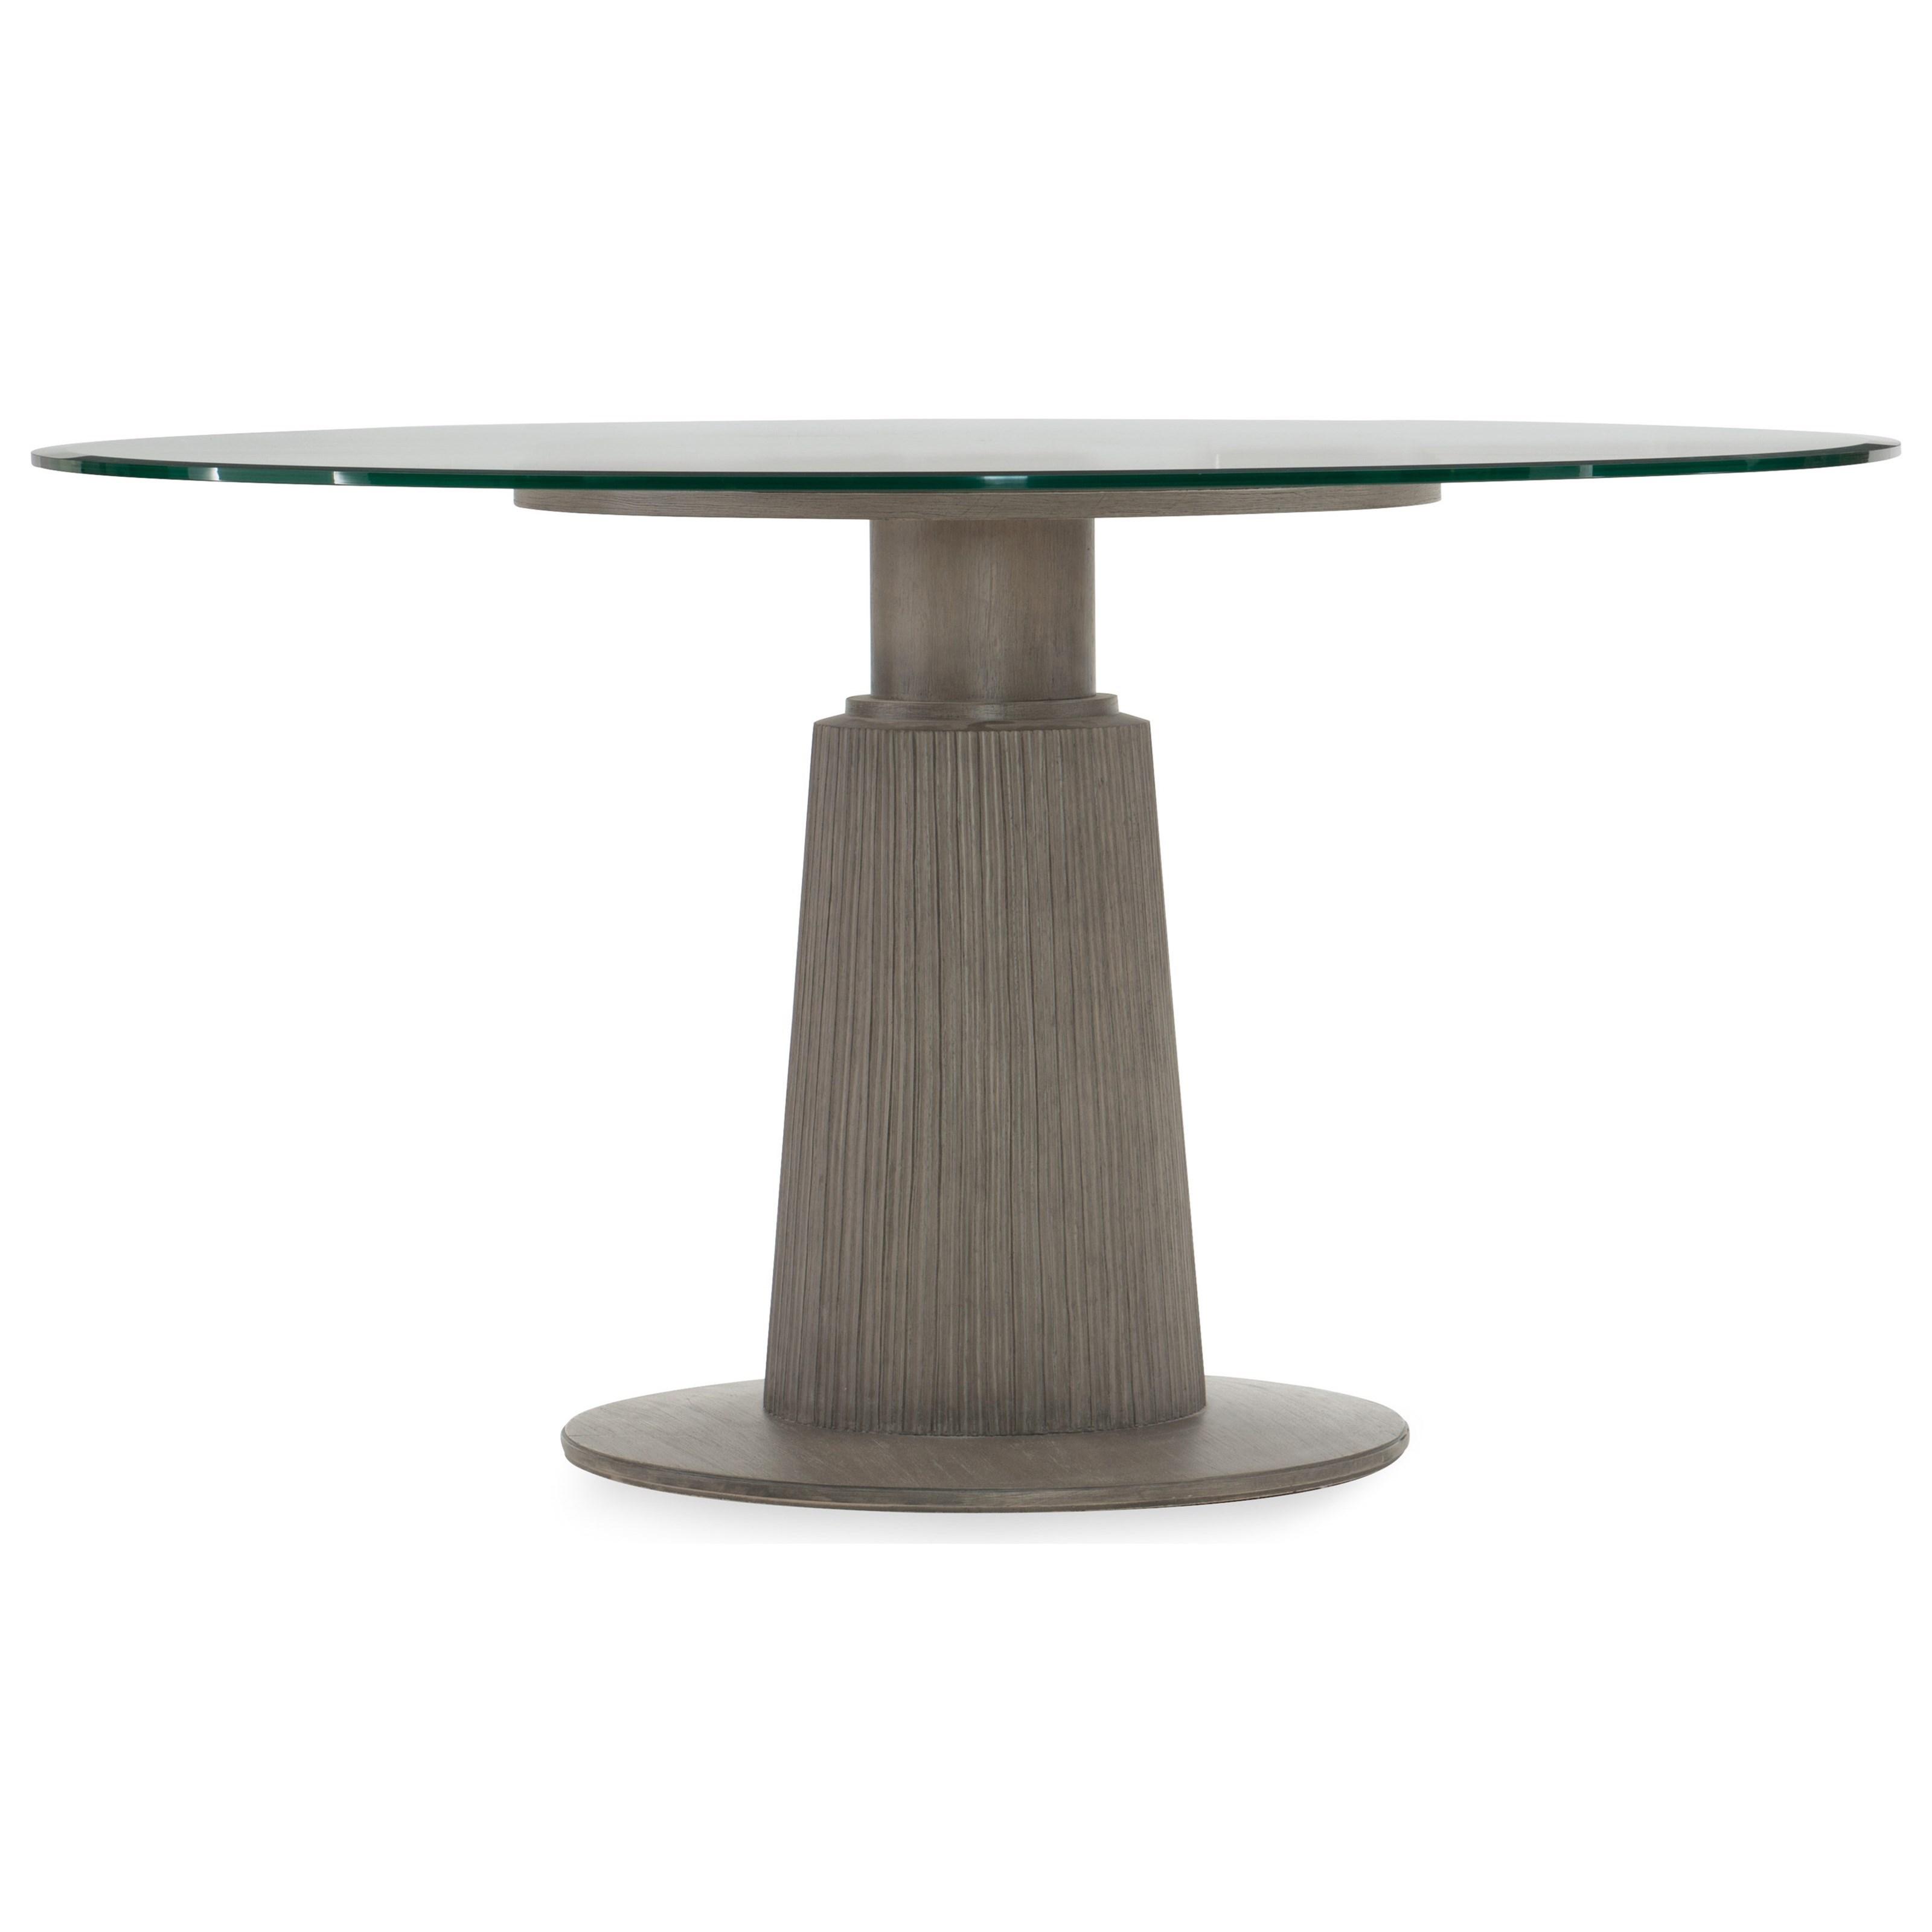 Hooker Furniture Elixir 54 Adjustable Height Round Dining